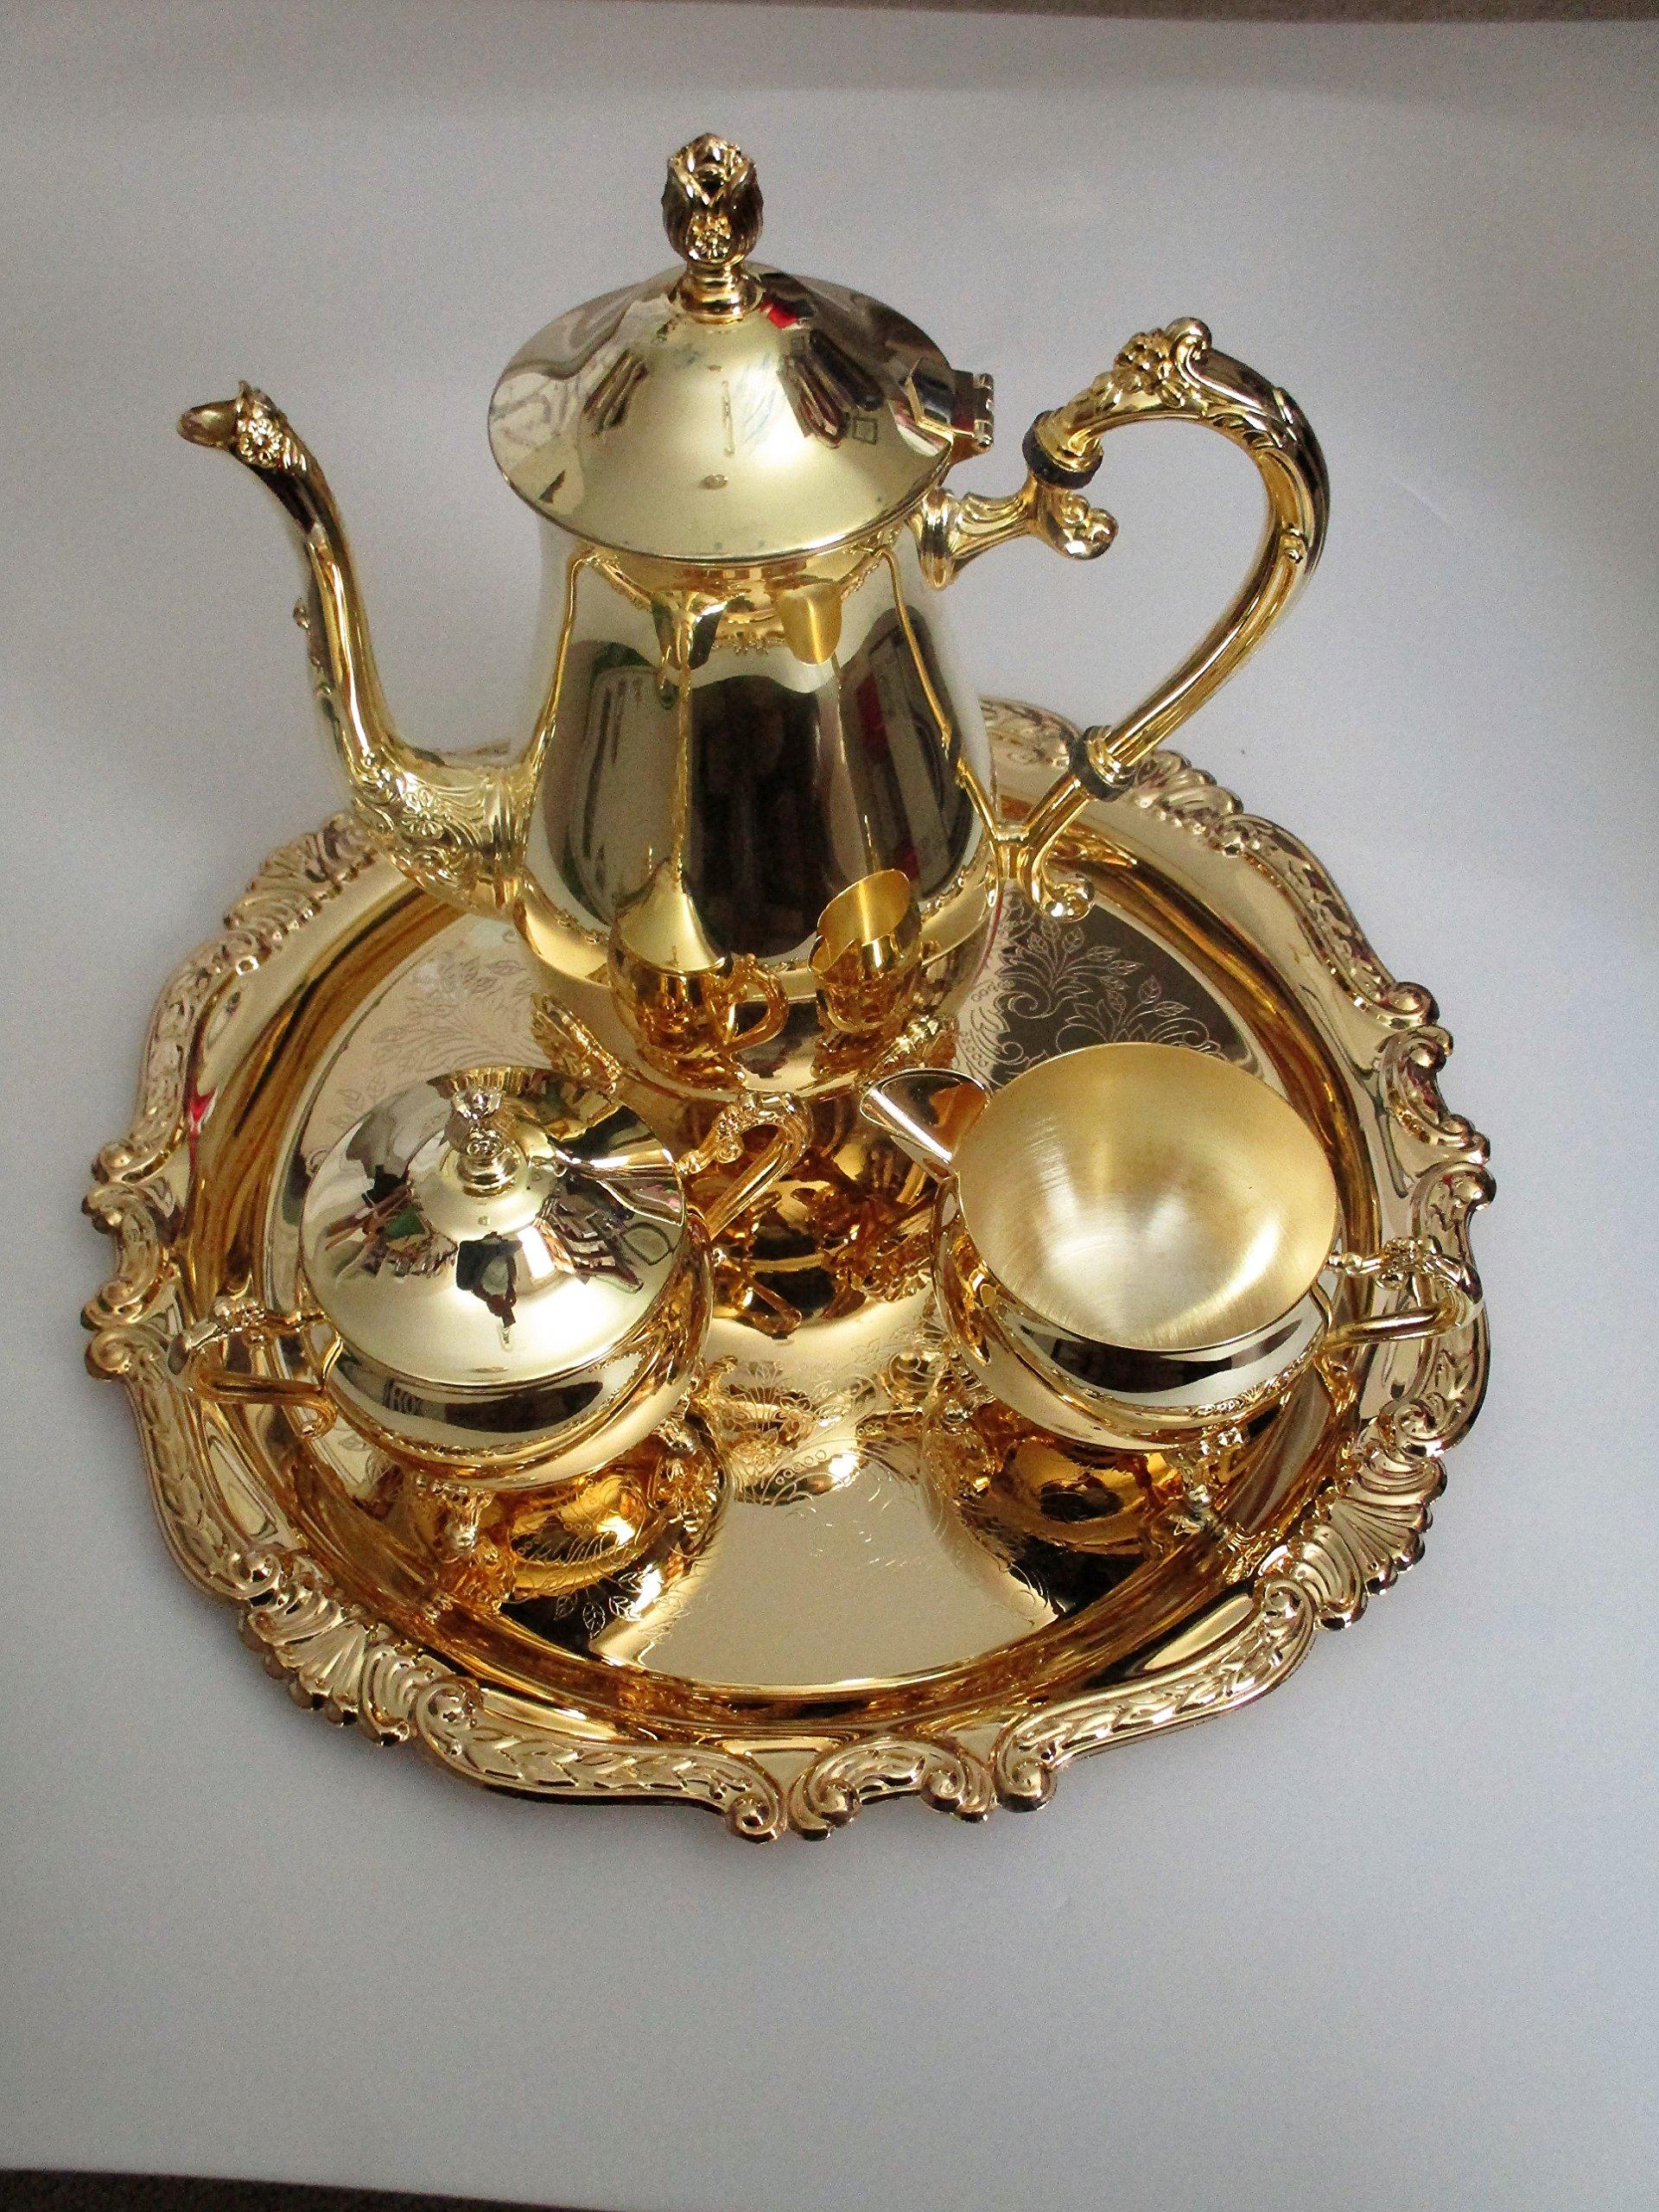 Sheridan Baroque Goldplated 4 pc. Coffee Set ... Coffee Pot, Creamer, Covered Sugar Bowl & Tray